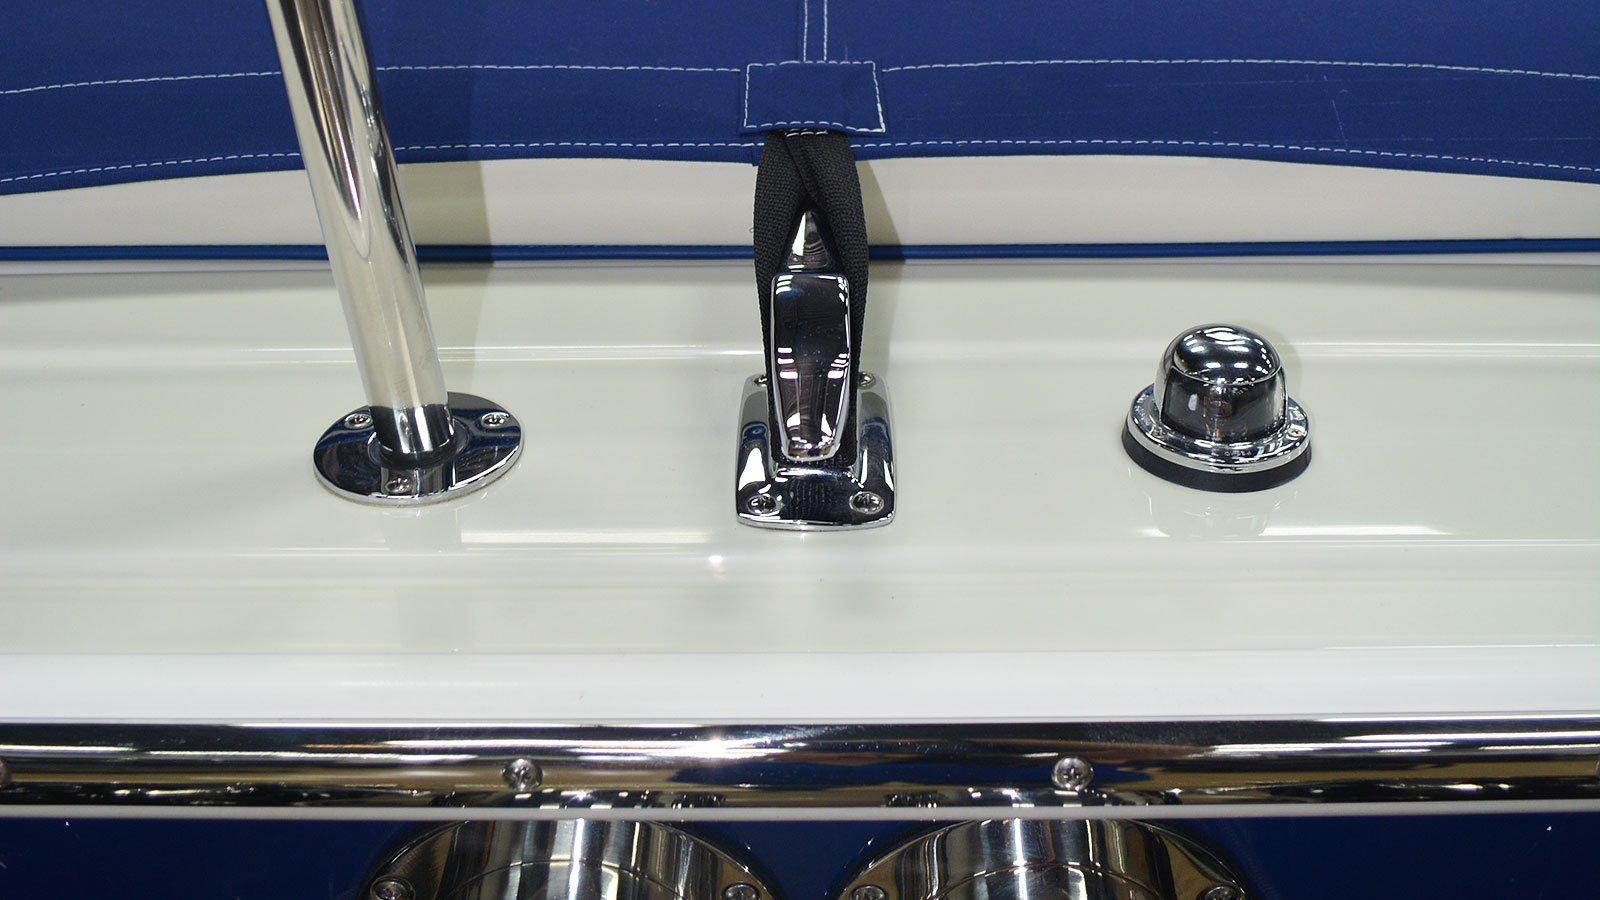 interior-boat-fixtures